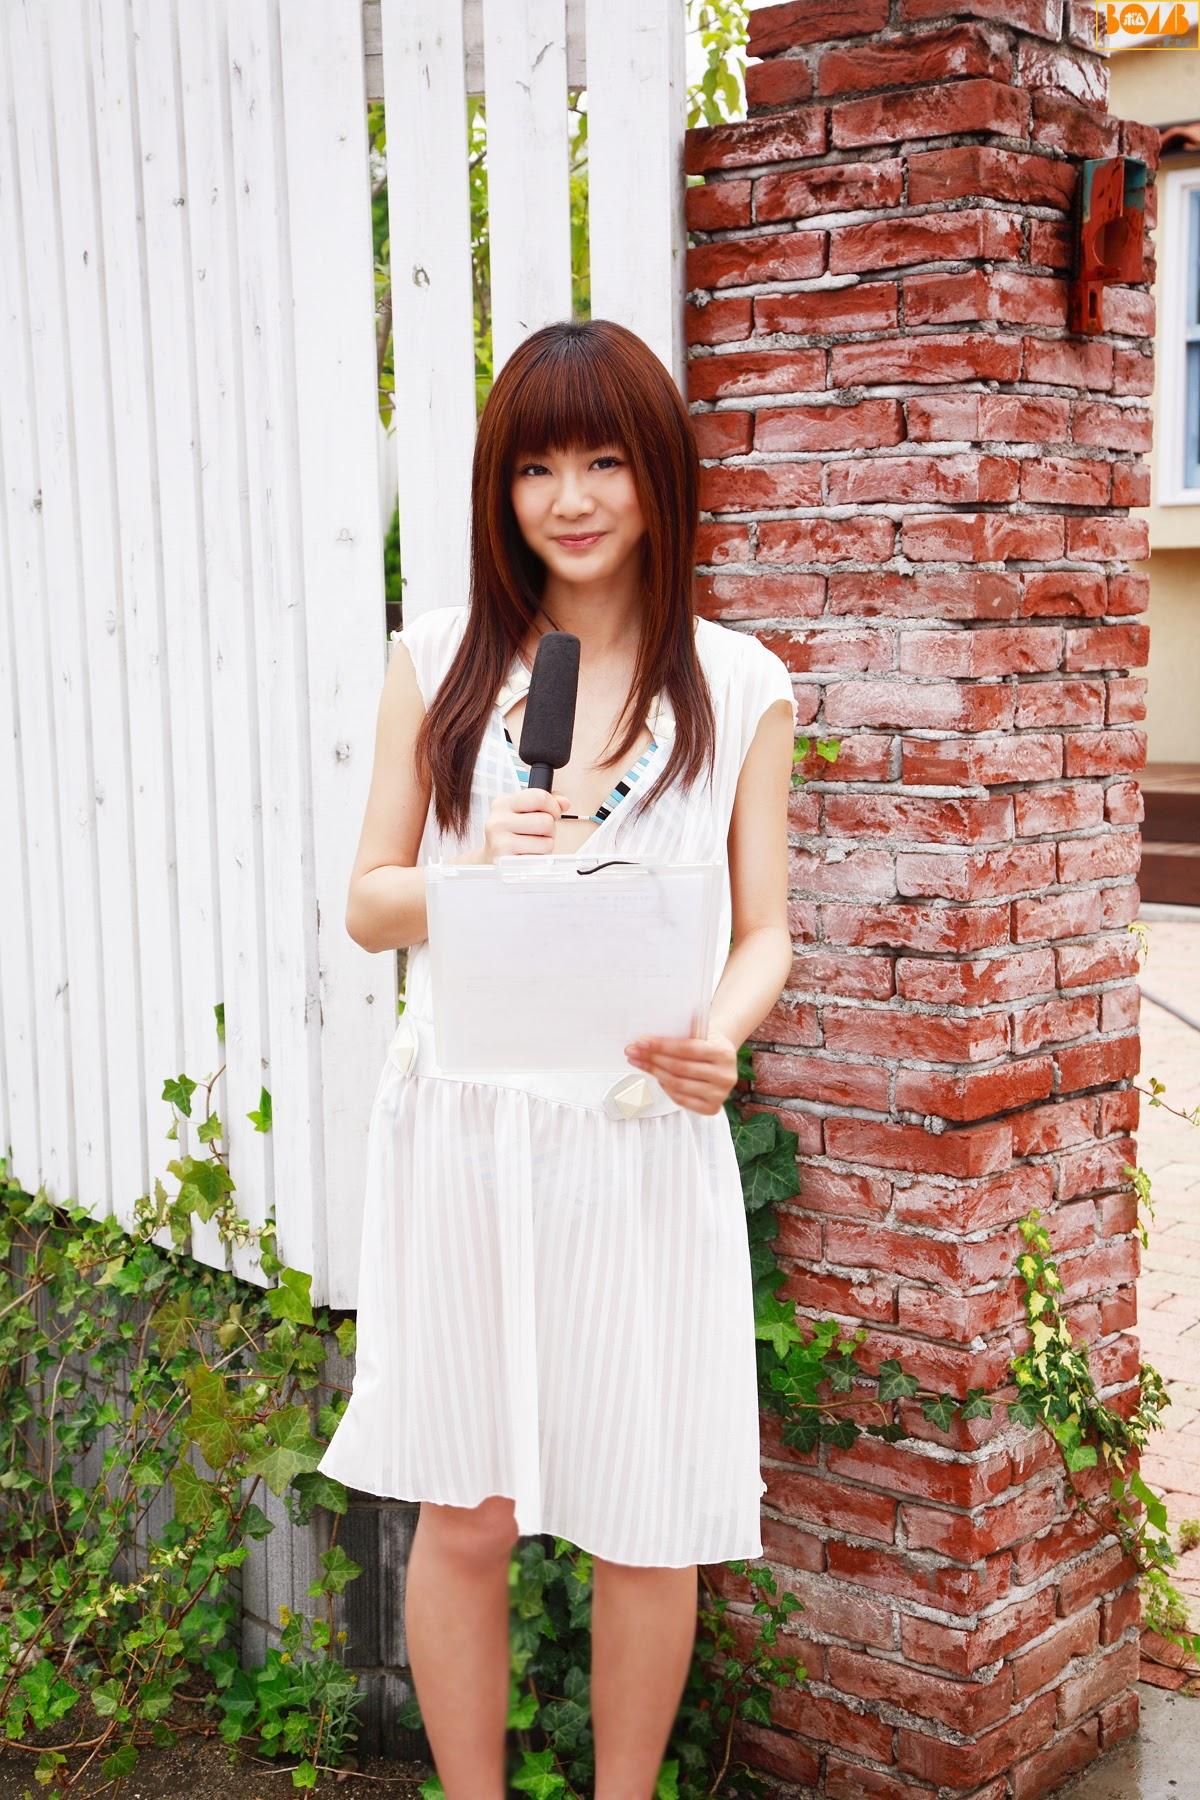 New era gravure harbor contact wet transparent sheer weather sister Rika Sato012